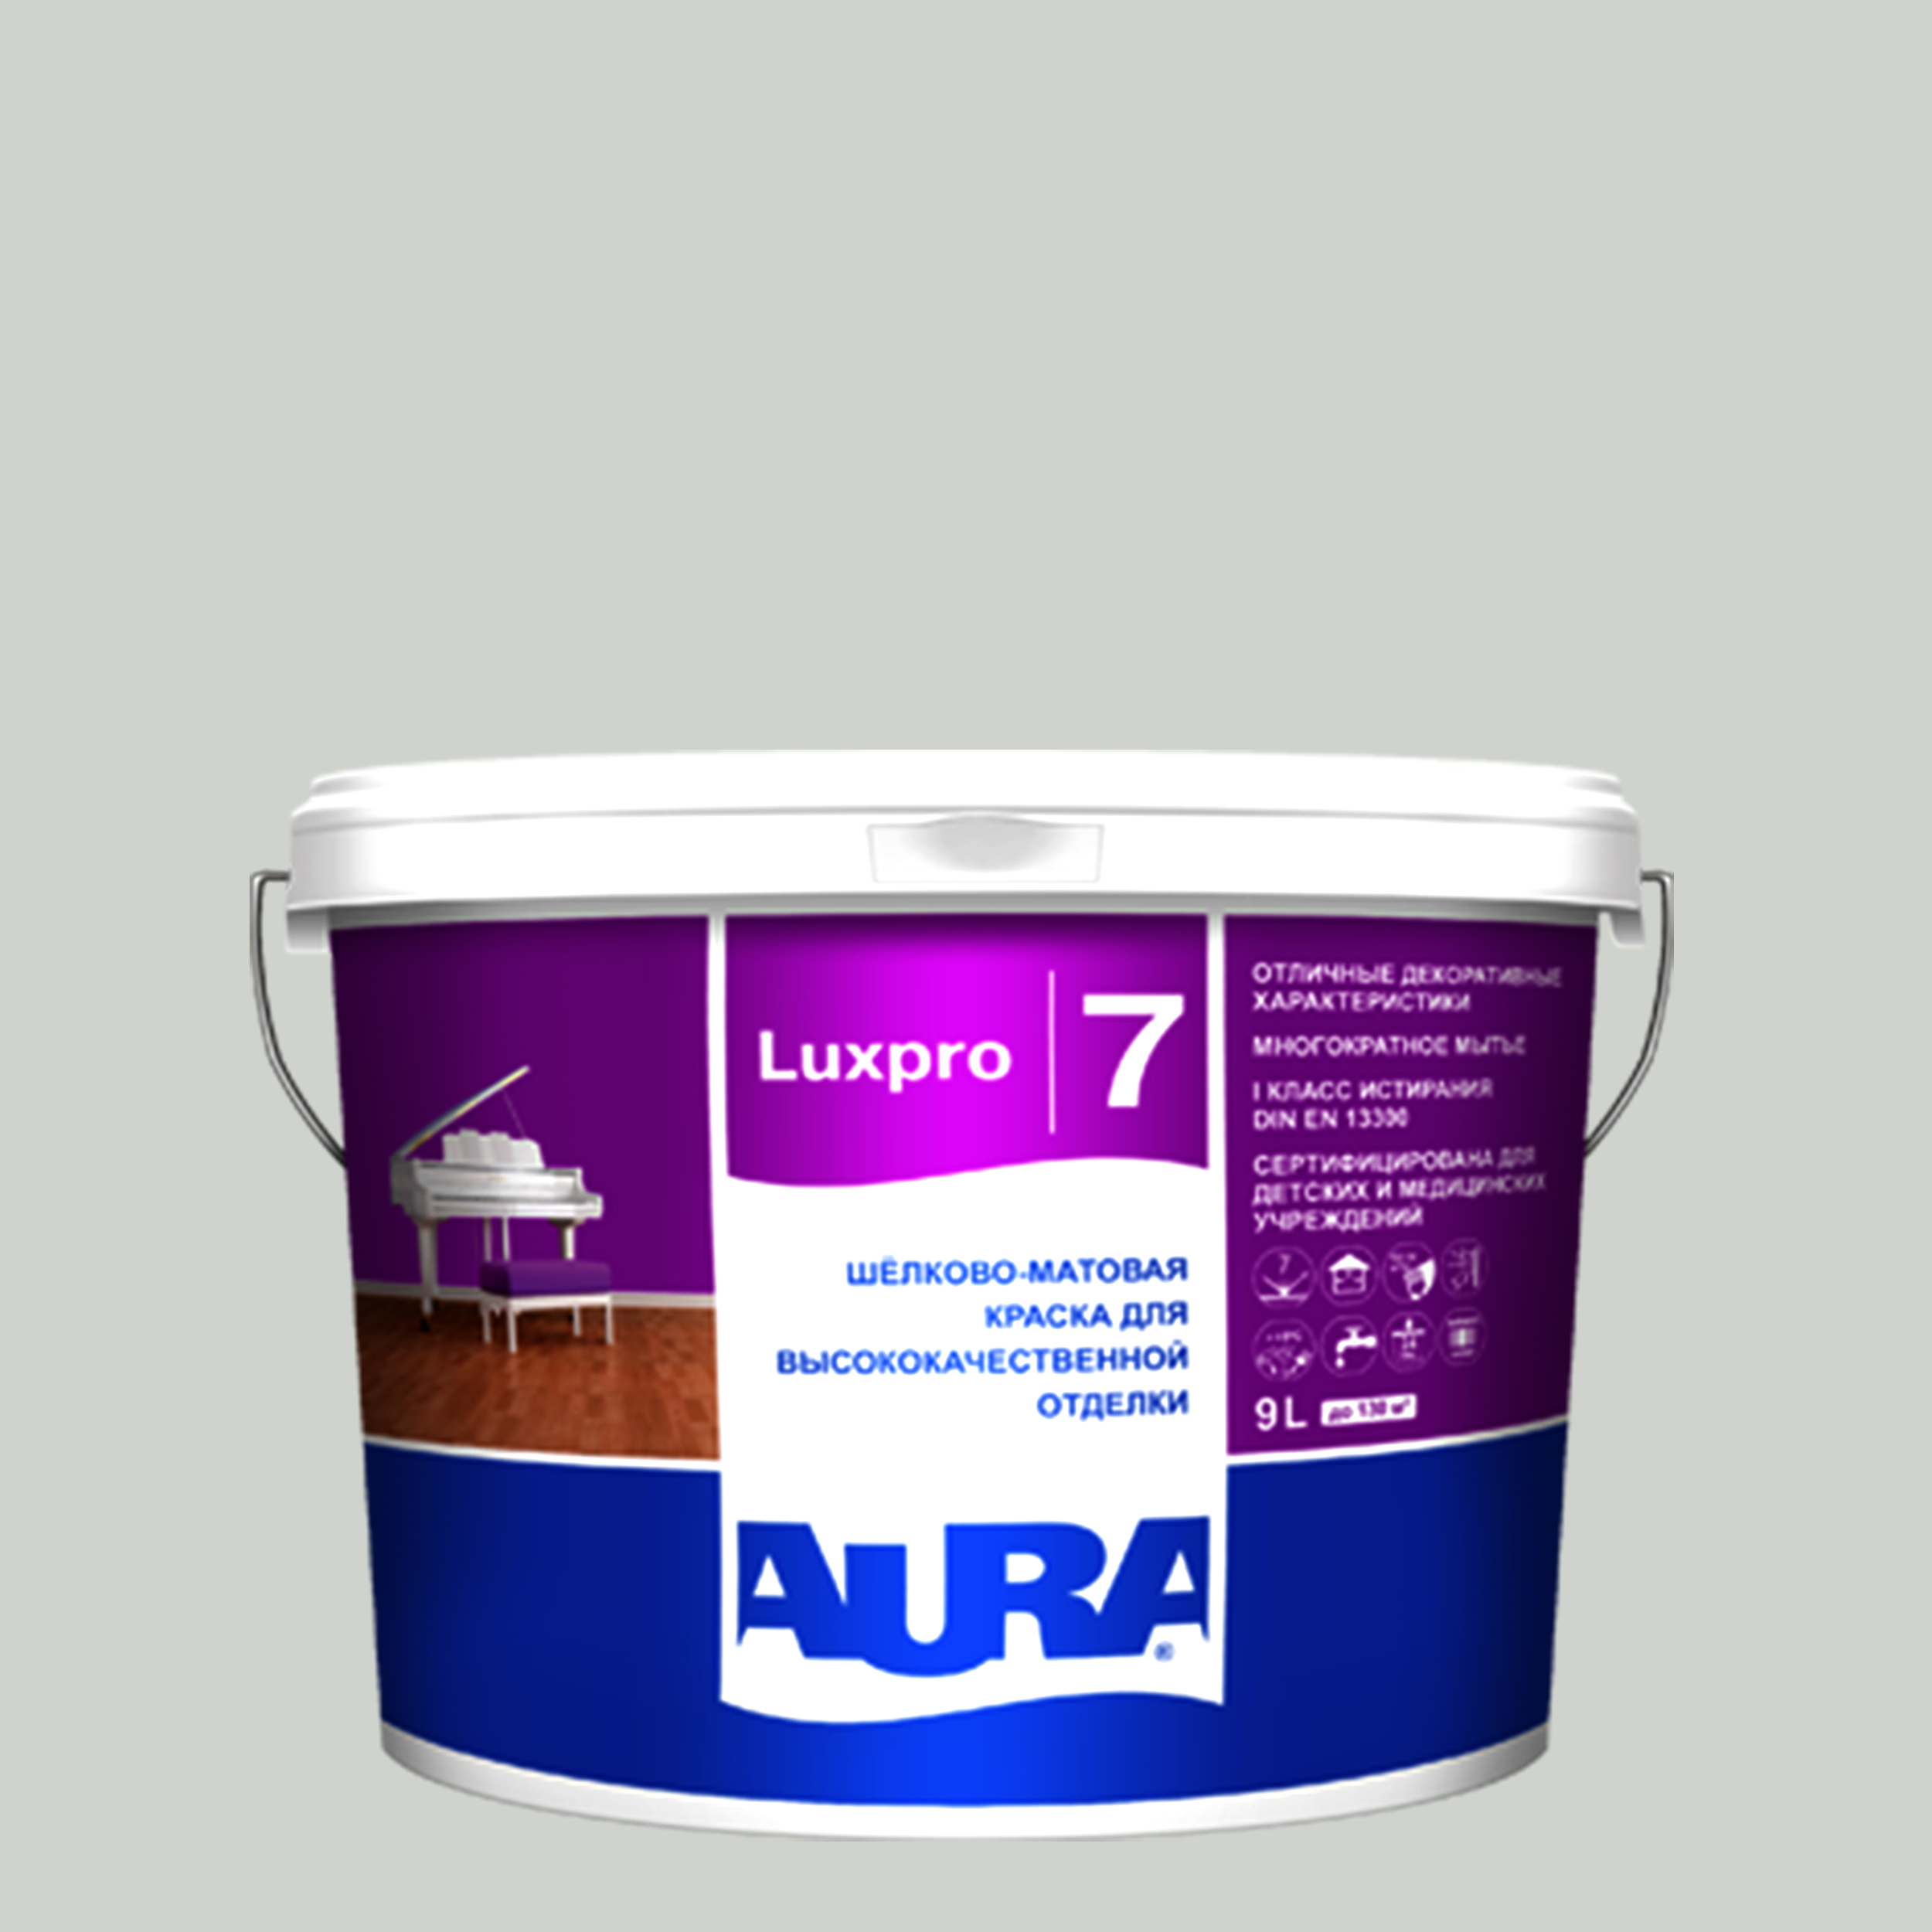 Фото 4 - Краска интерьерная, Aura LuxPRO 7, RAL 1003, 11 кг.